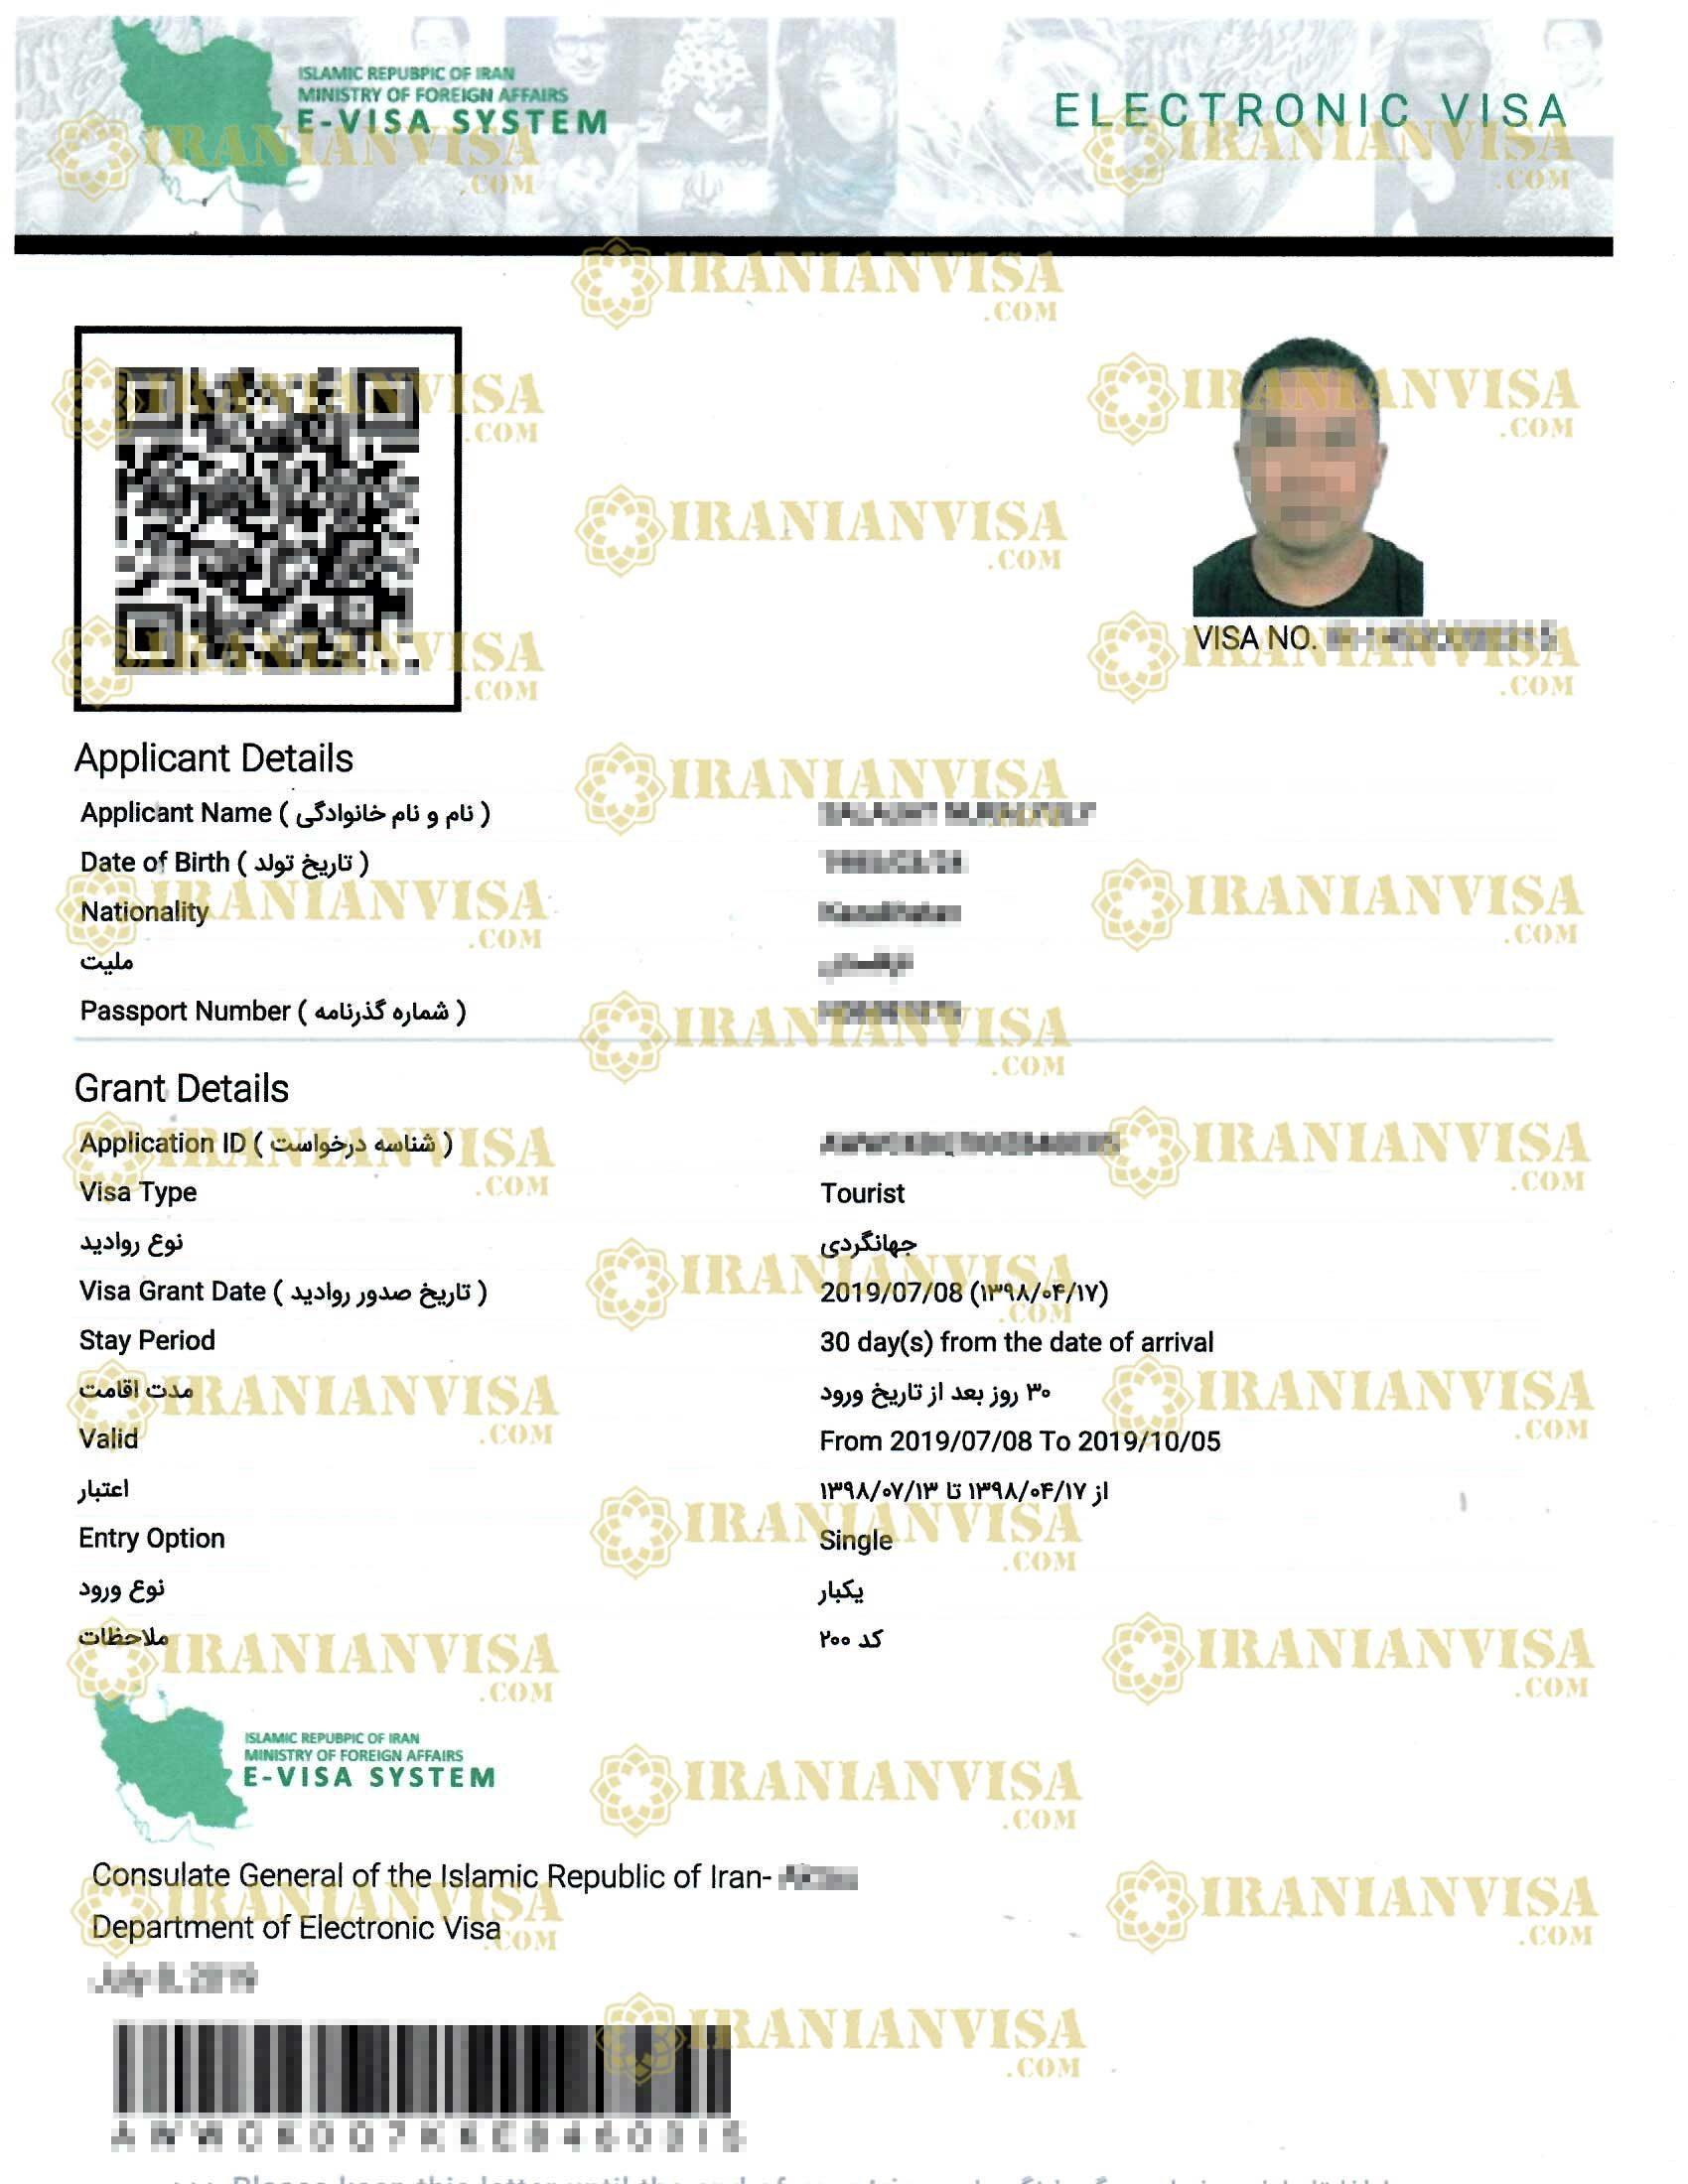 Iran Visa Application 20 Only Iran Visa By Iranianvisa Com